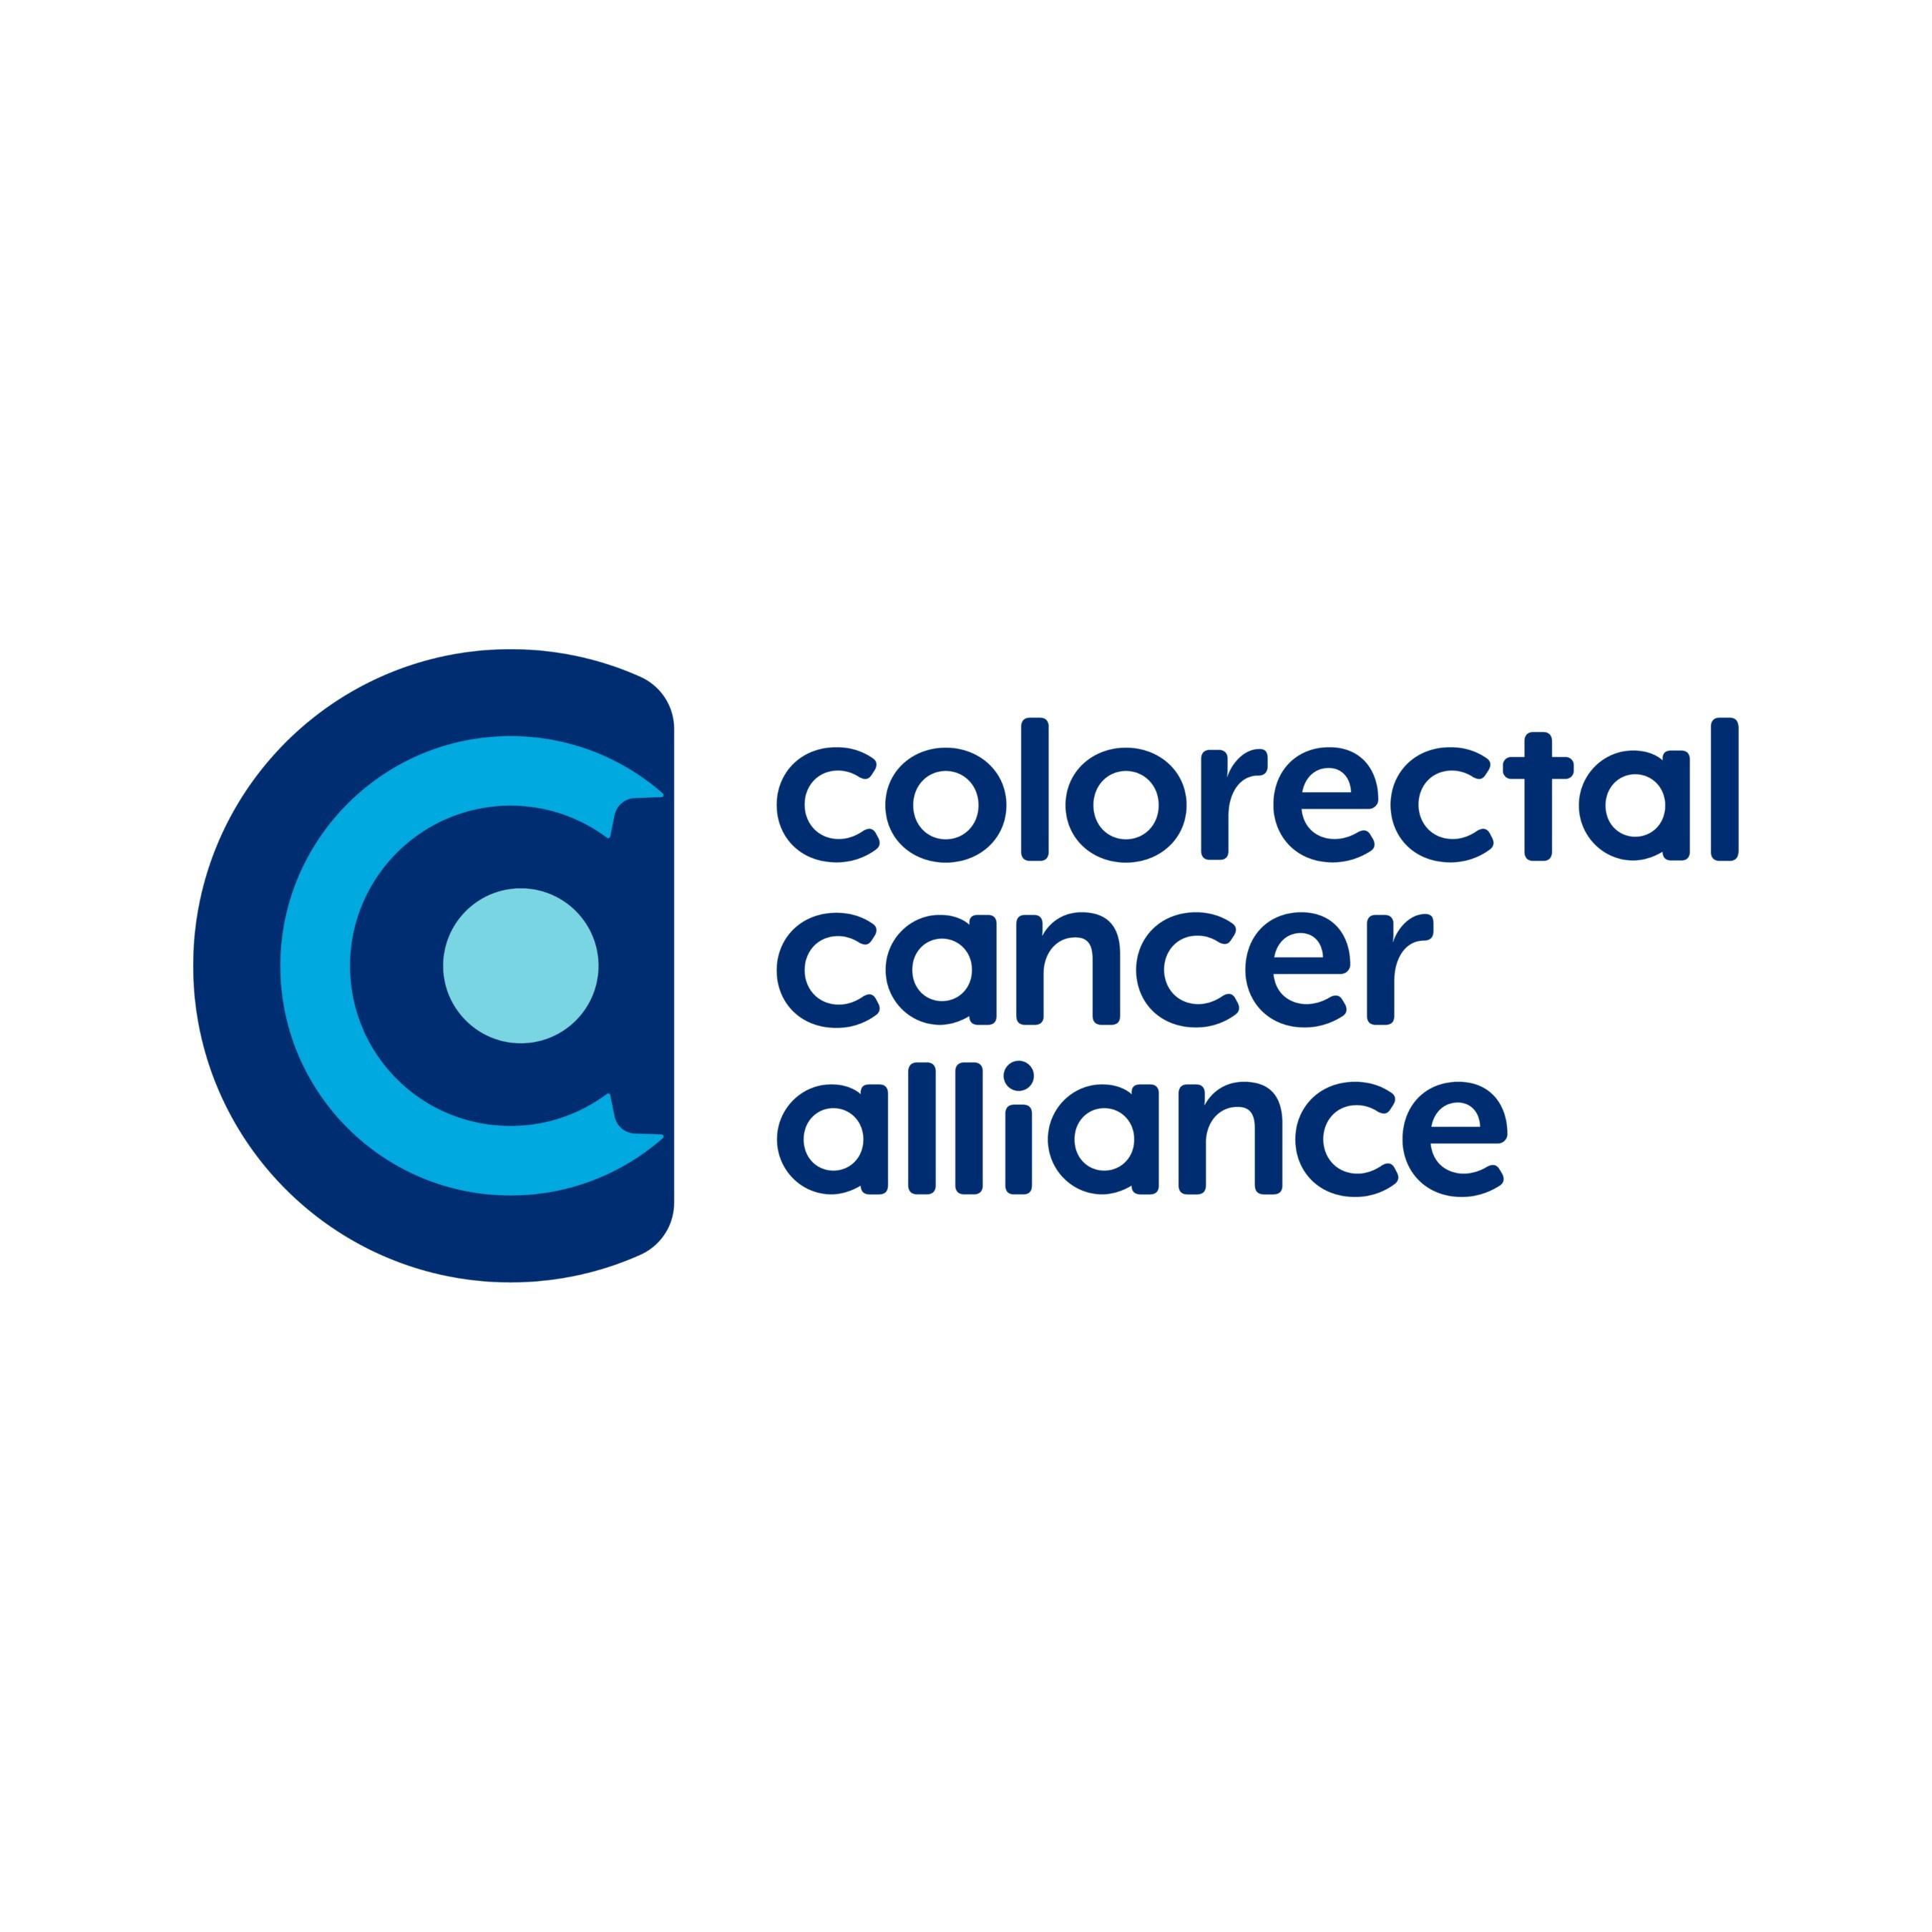 The Future Of Colorectal Cancer Care Is Precision Medicine